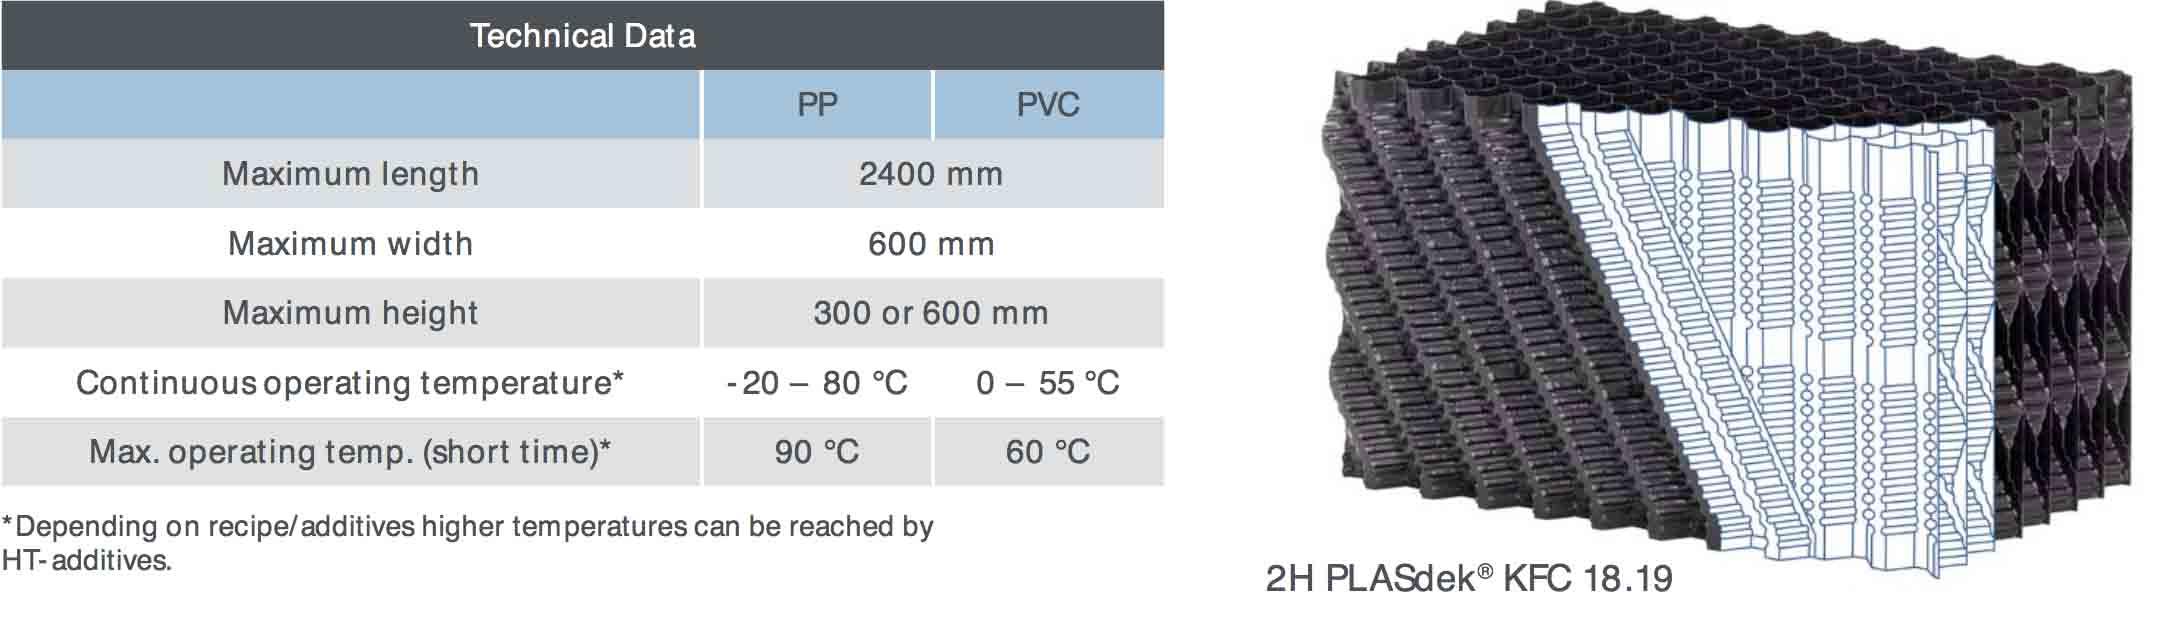 Vertical Flow Plasdek2